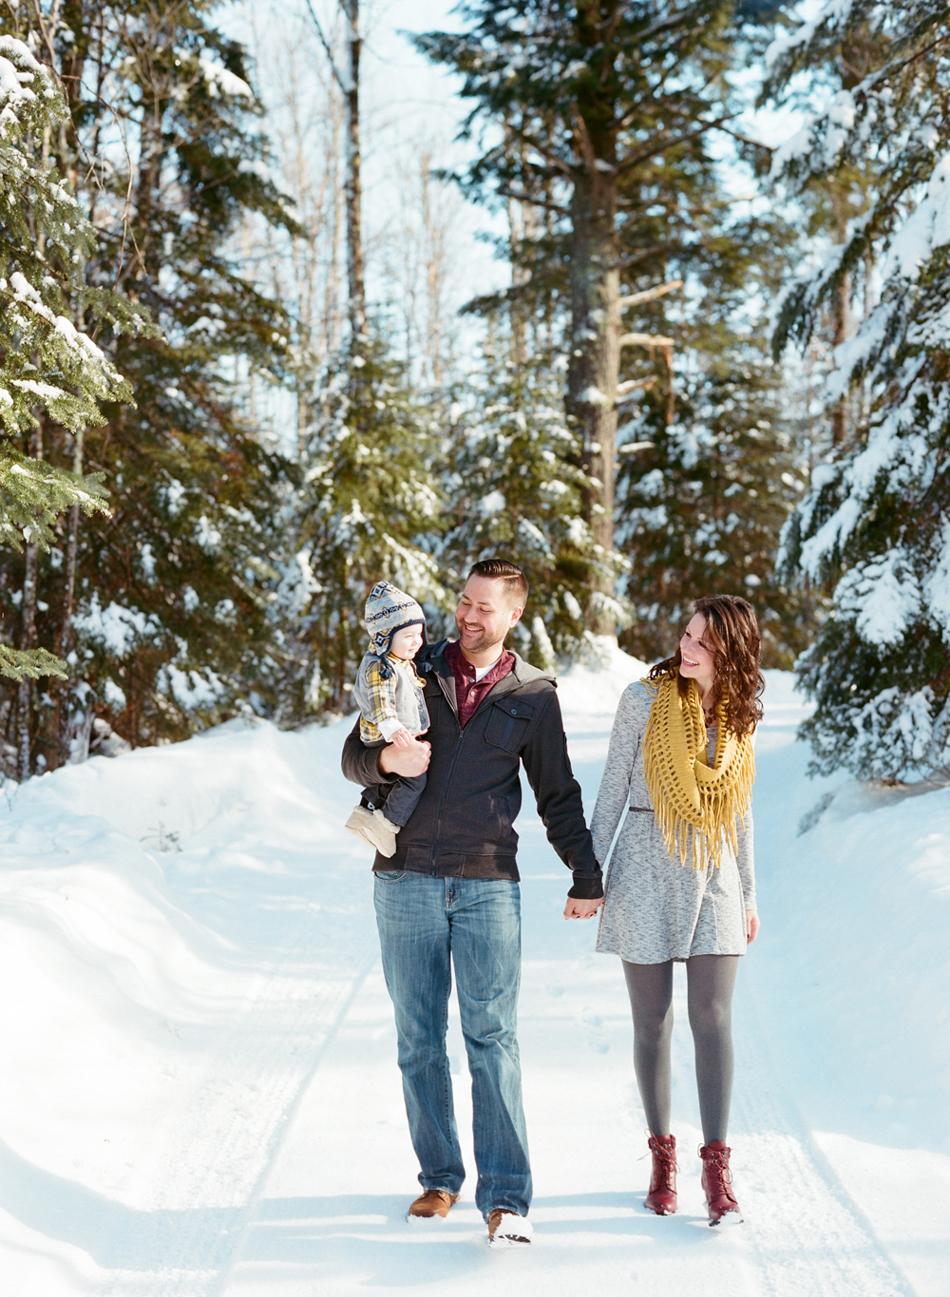 Winter_Family_Photography_Wisconsin_002.jpg